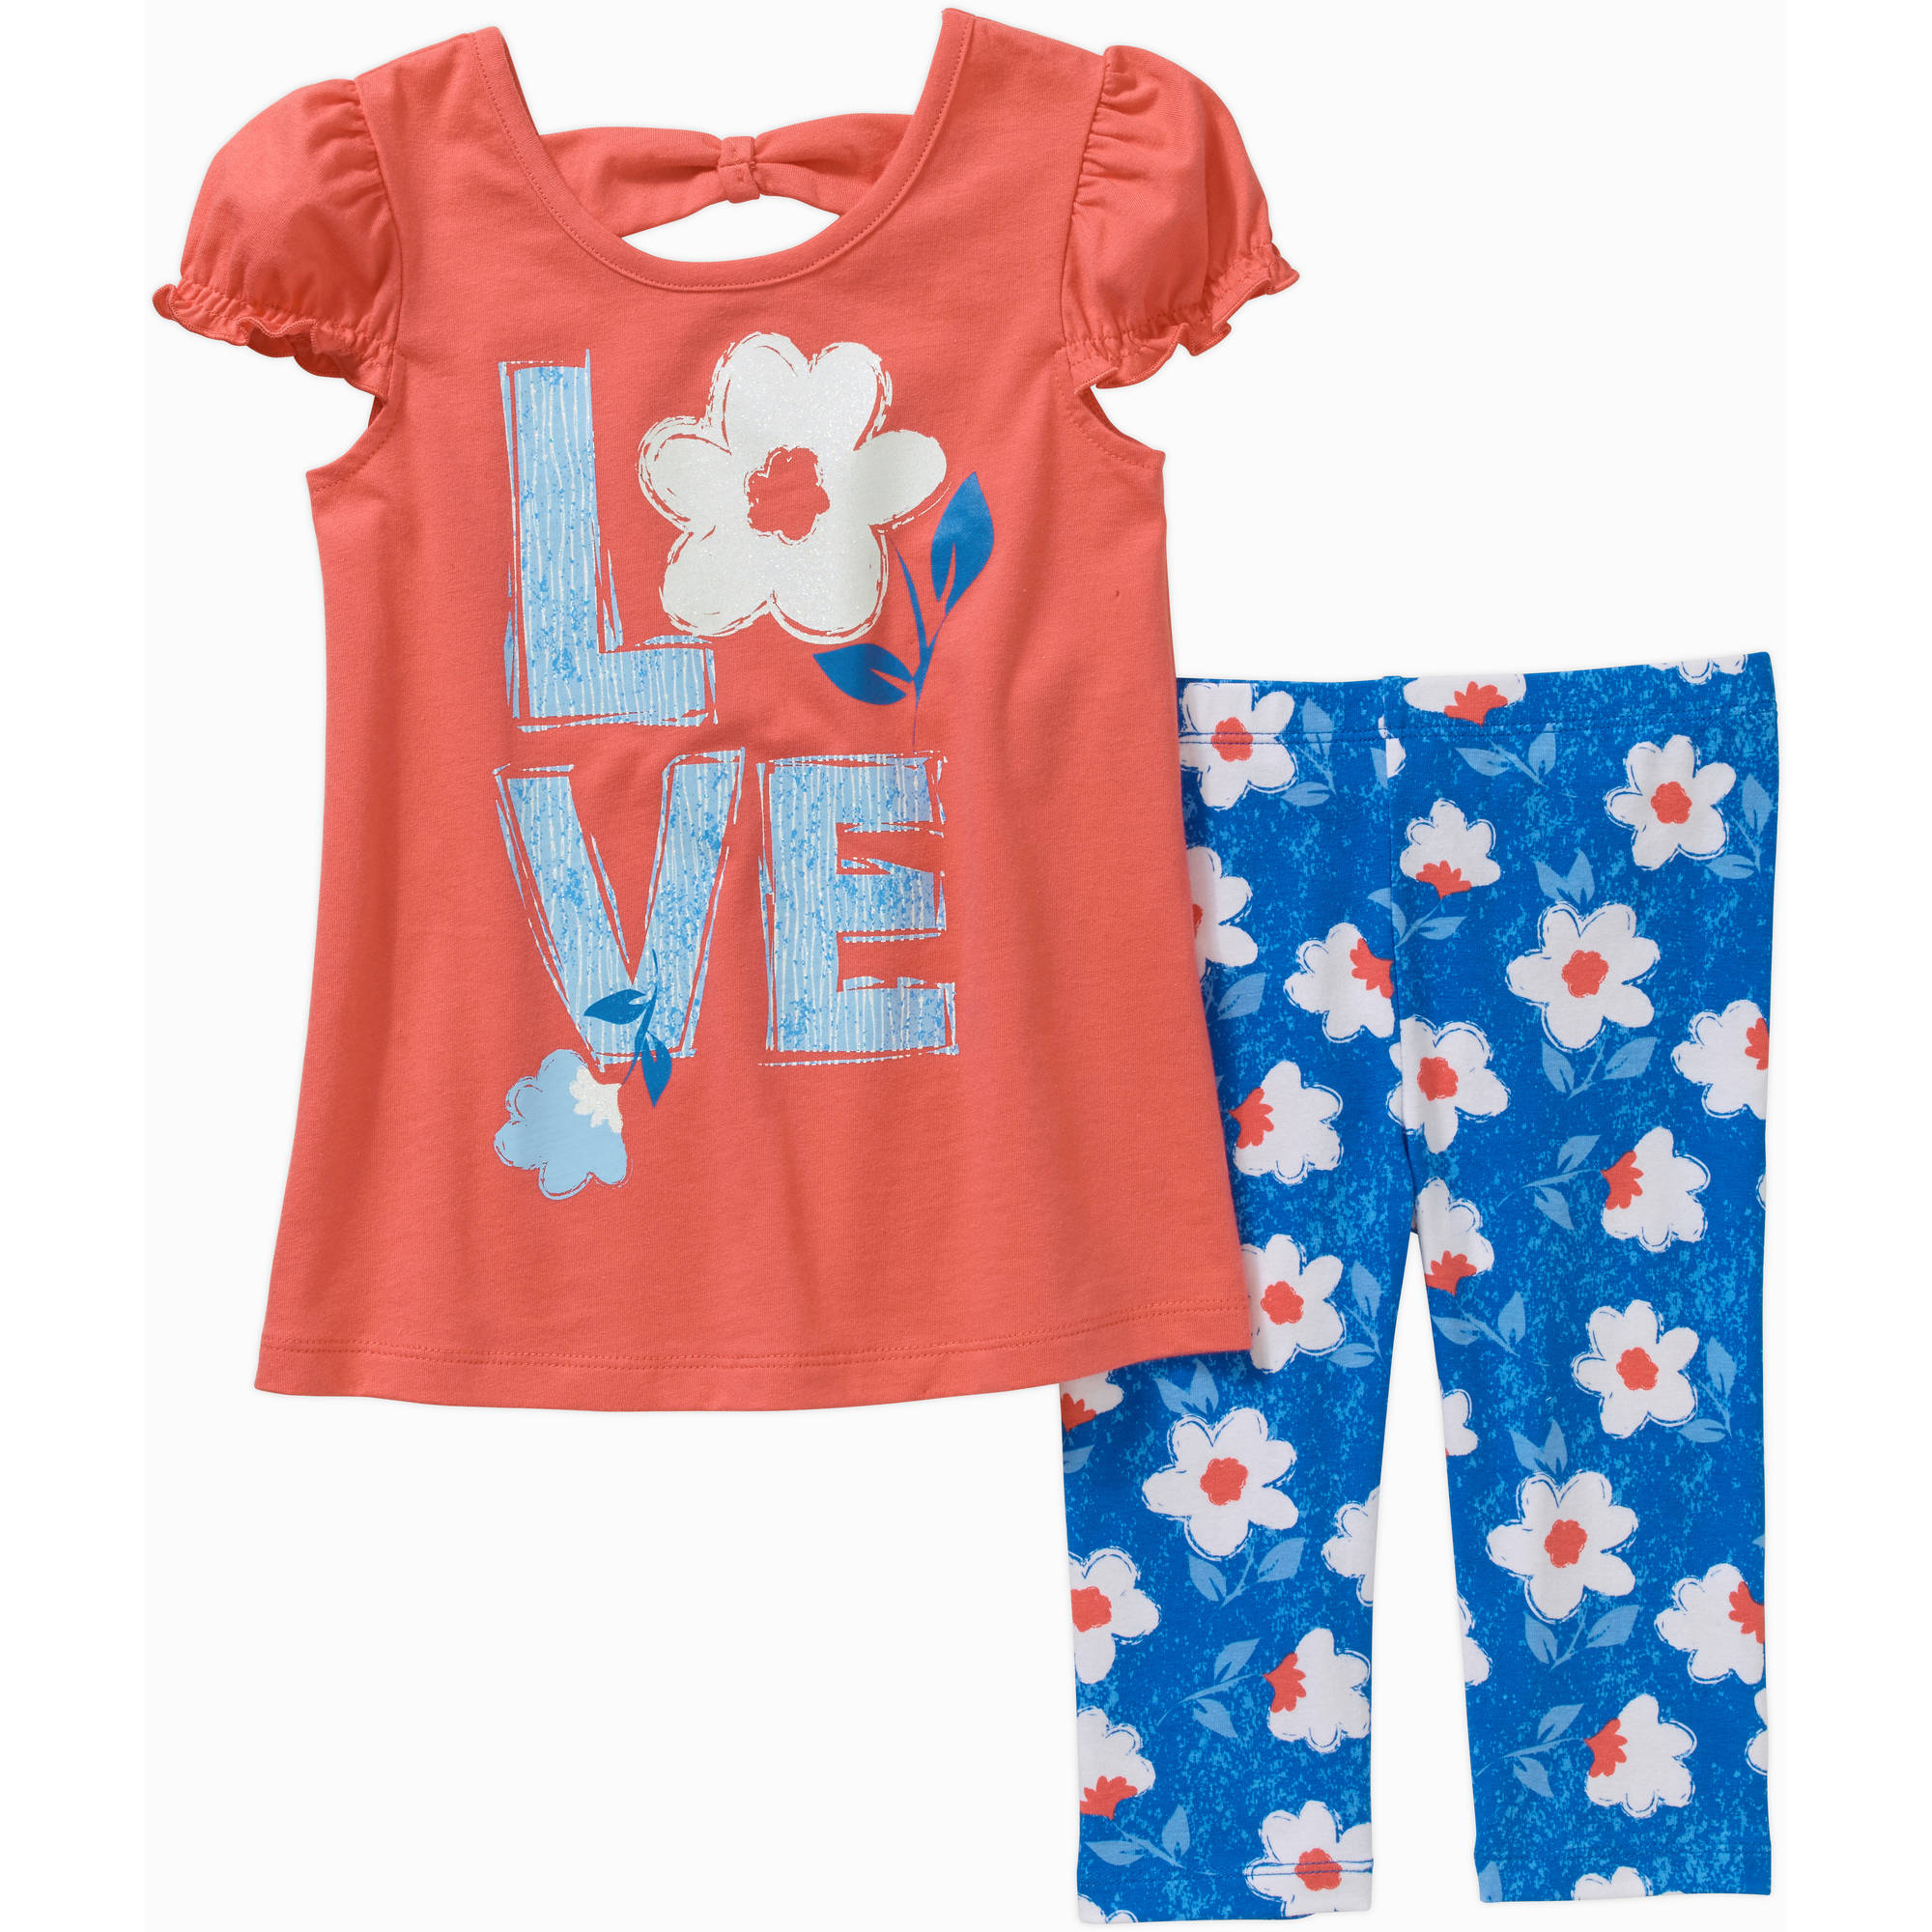 Newborn Baby Girls\' Knit Tunic and Leggings Outfit Set - Walmart.com